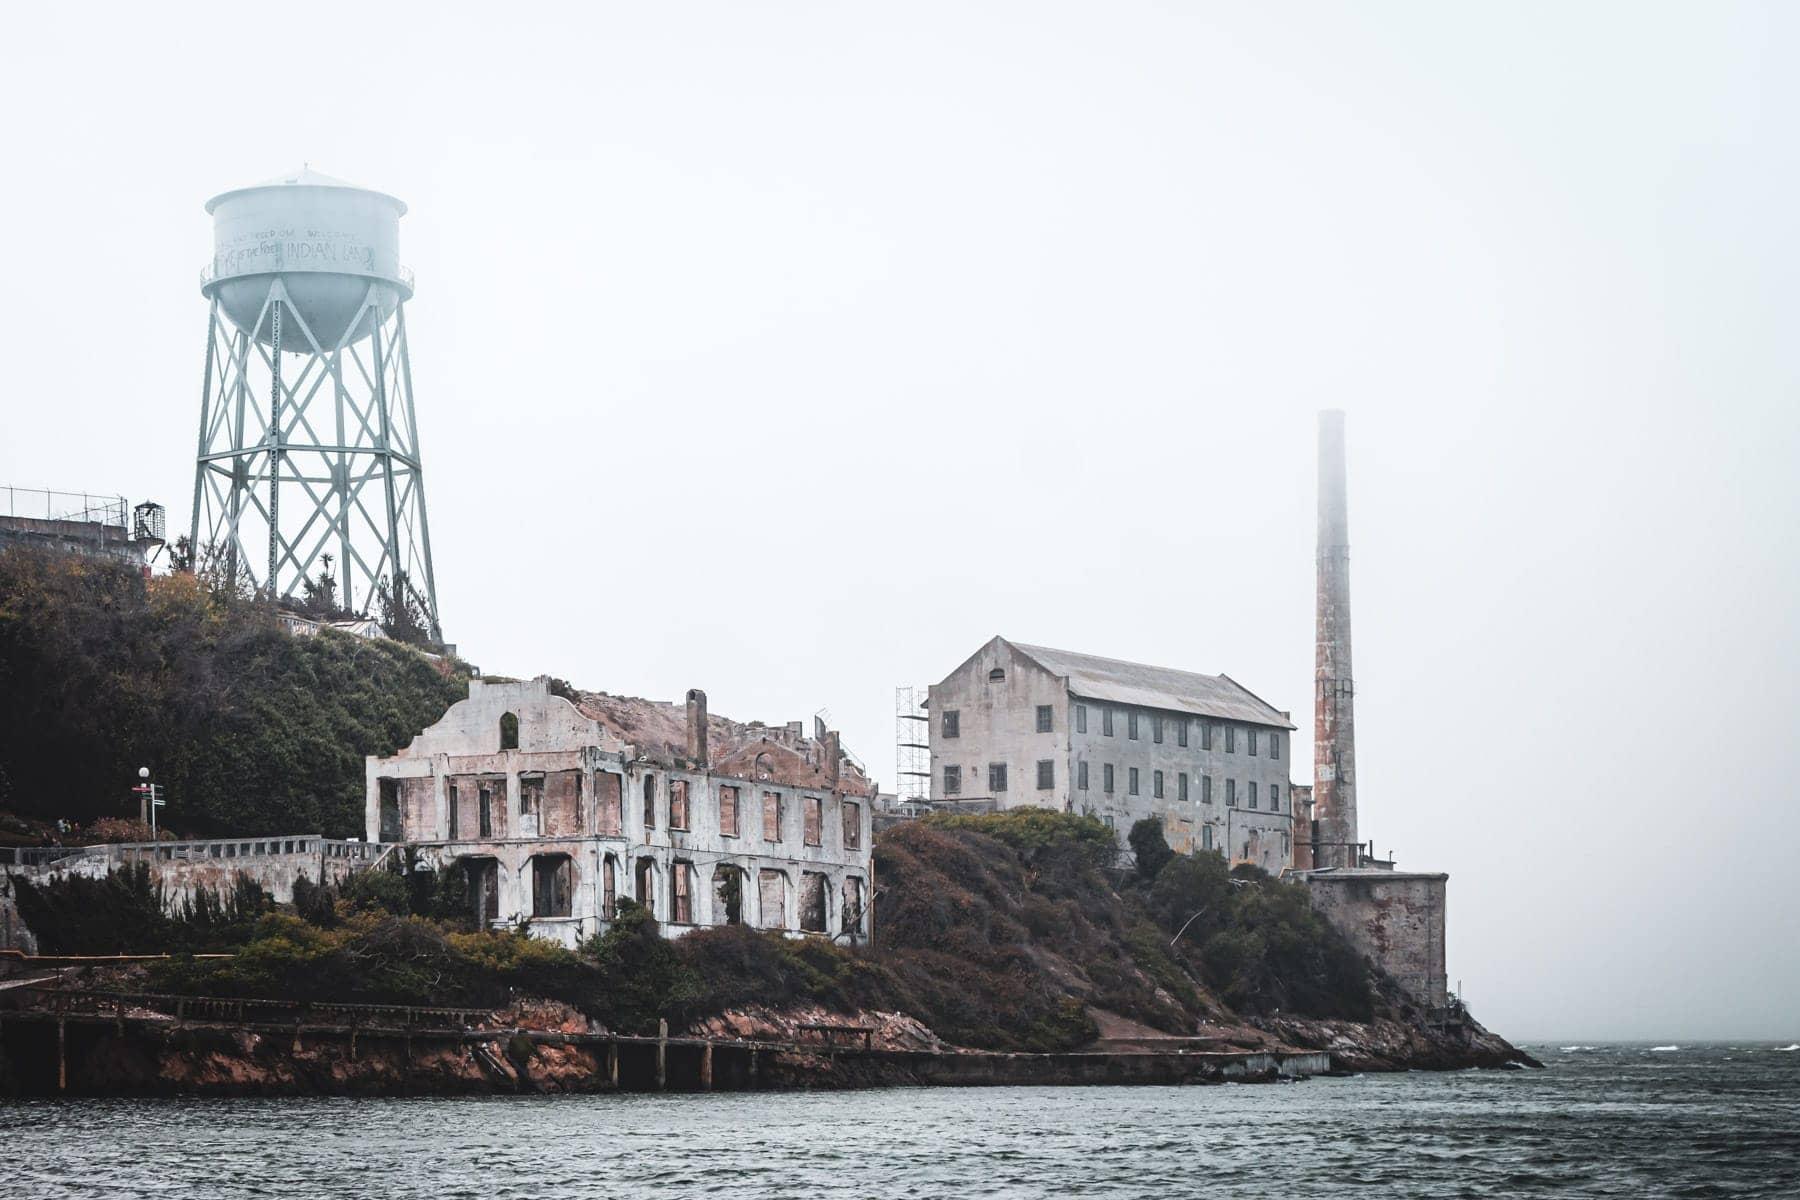 The San Francisco Bay fog envelops the ruins of Alcatraz Prison.